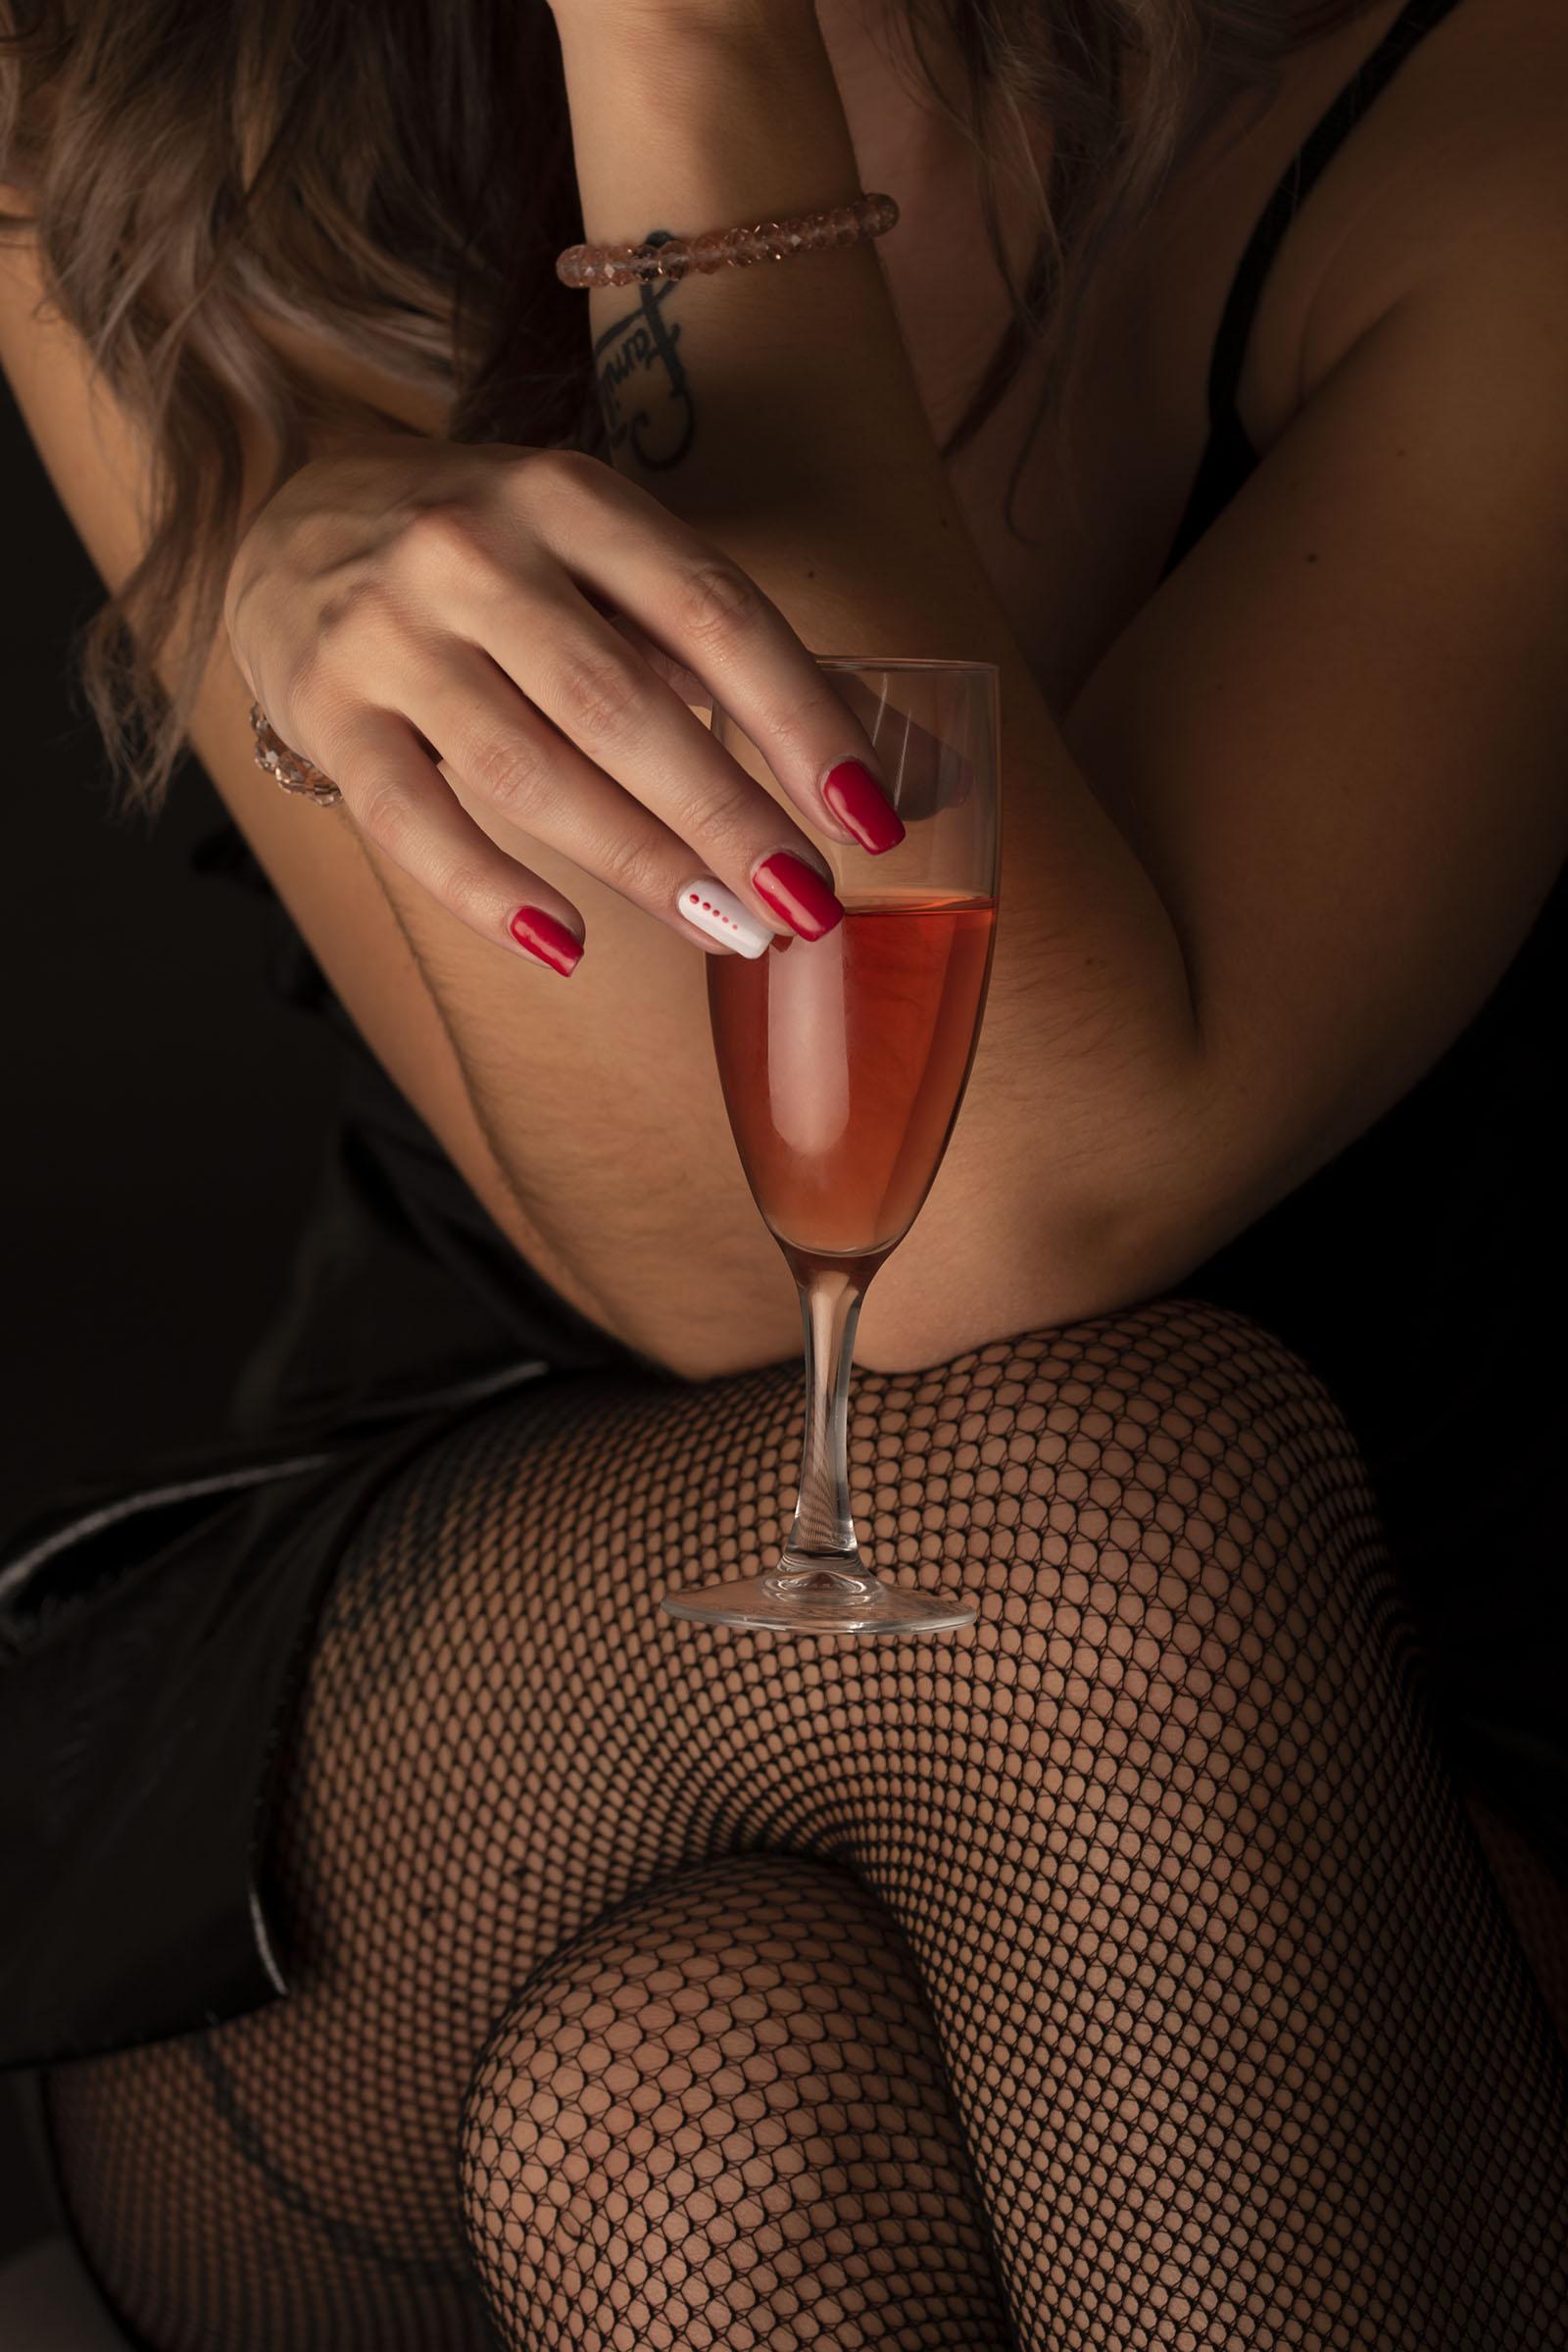 Urša Gradišnik: Some champaign, maybe?